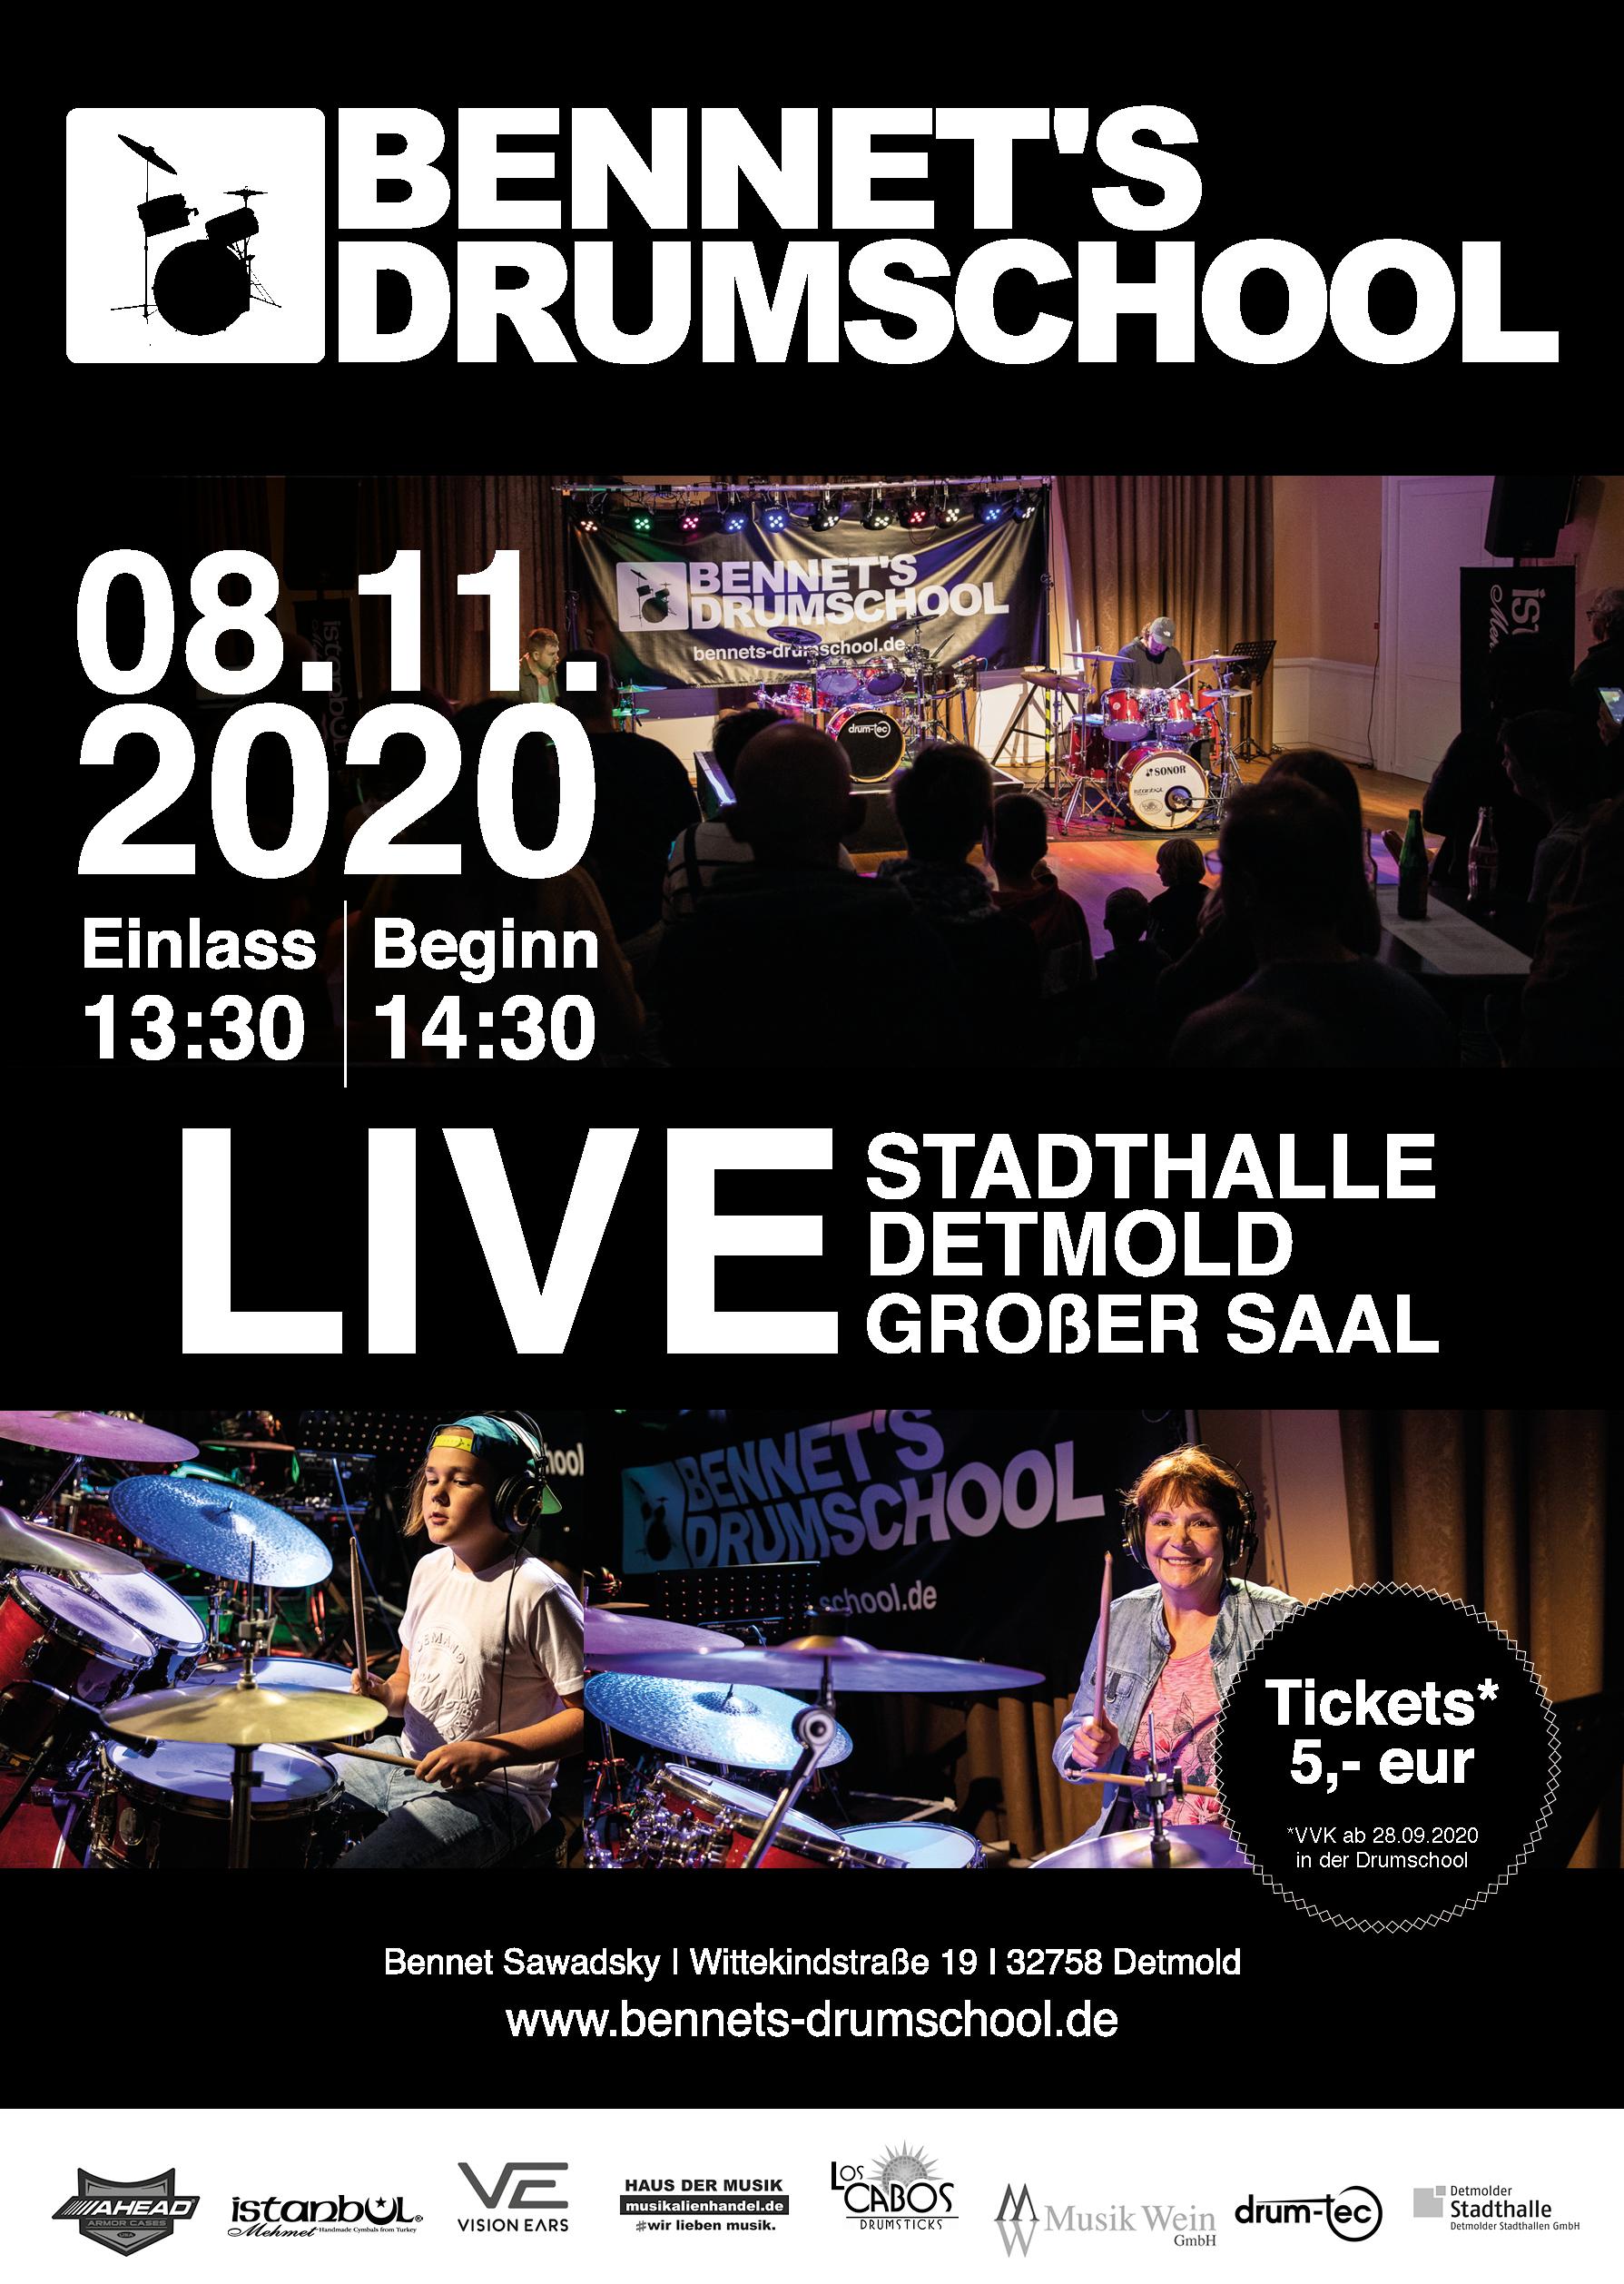 08.11.2020 Bennet´s Drumschool LIVE 2020 STADTHALLE Detmold (Großer Saal)